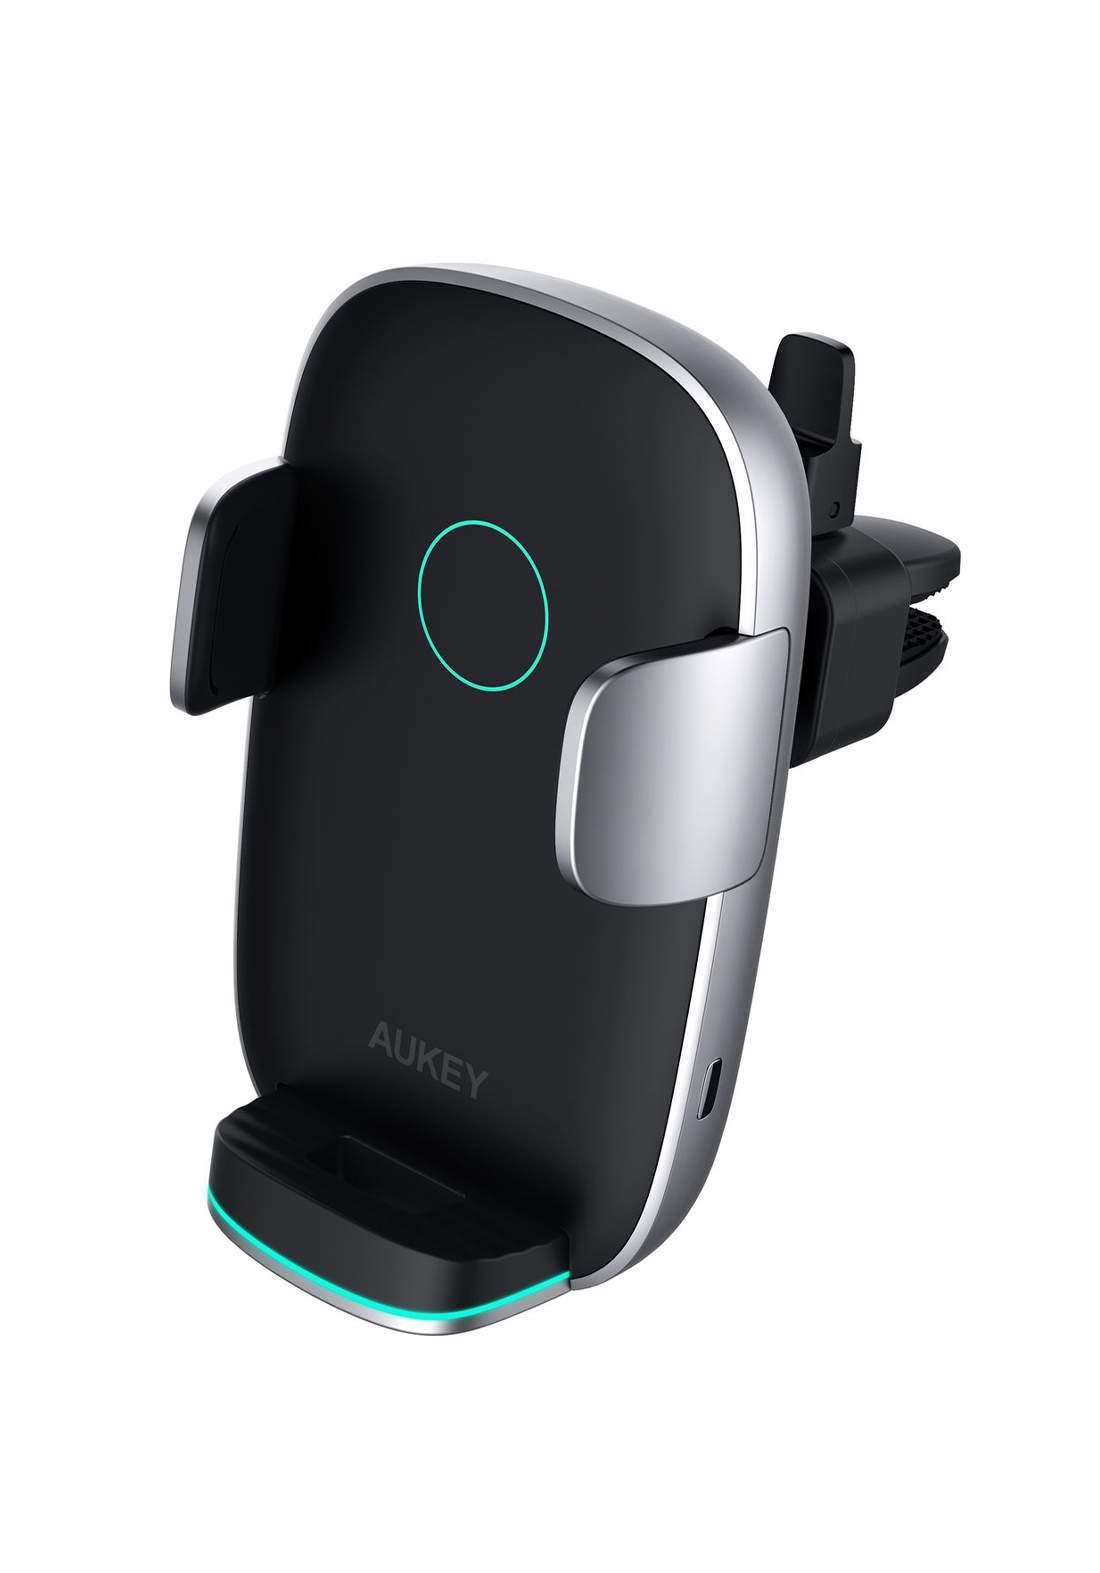 AUKEY HD-C52 Wireless Charging Phone Mount - BLACK  حامل وشاحن هاتف للسيارة